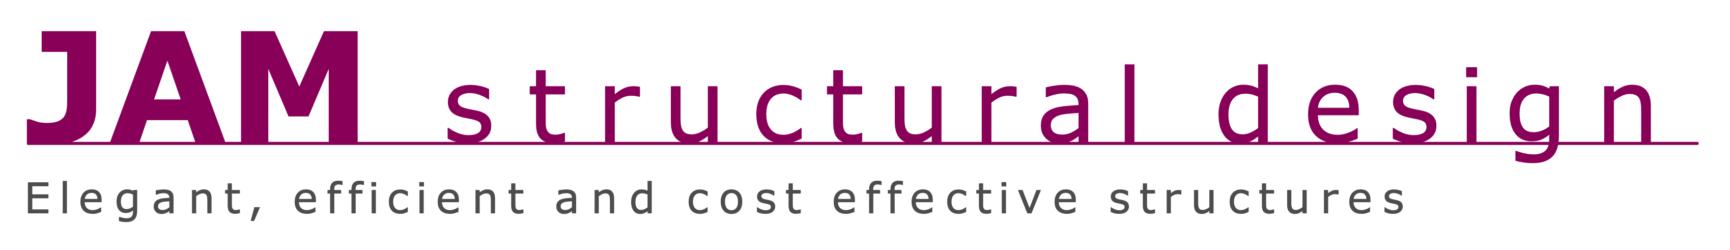 JAM Structural Design